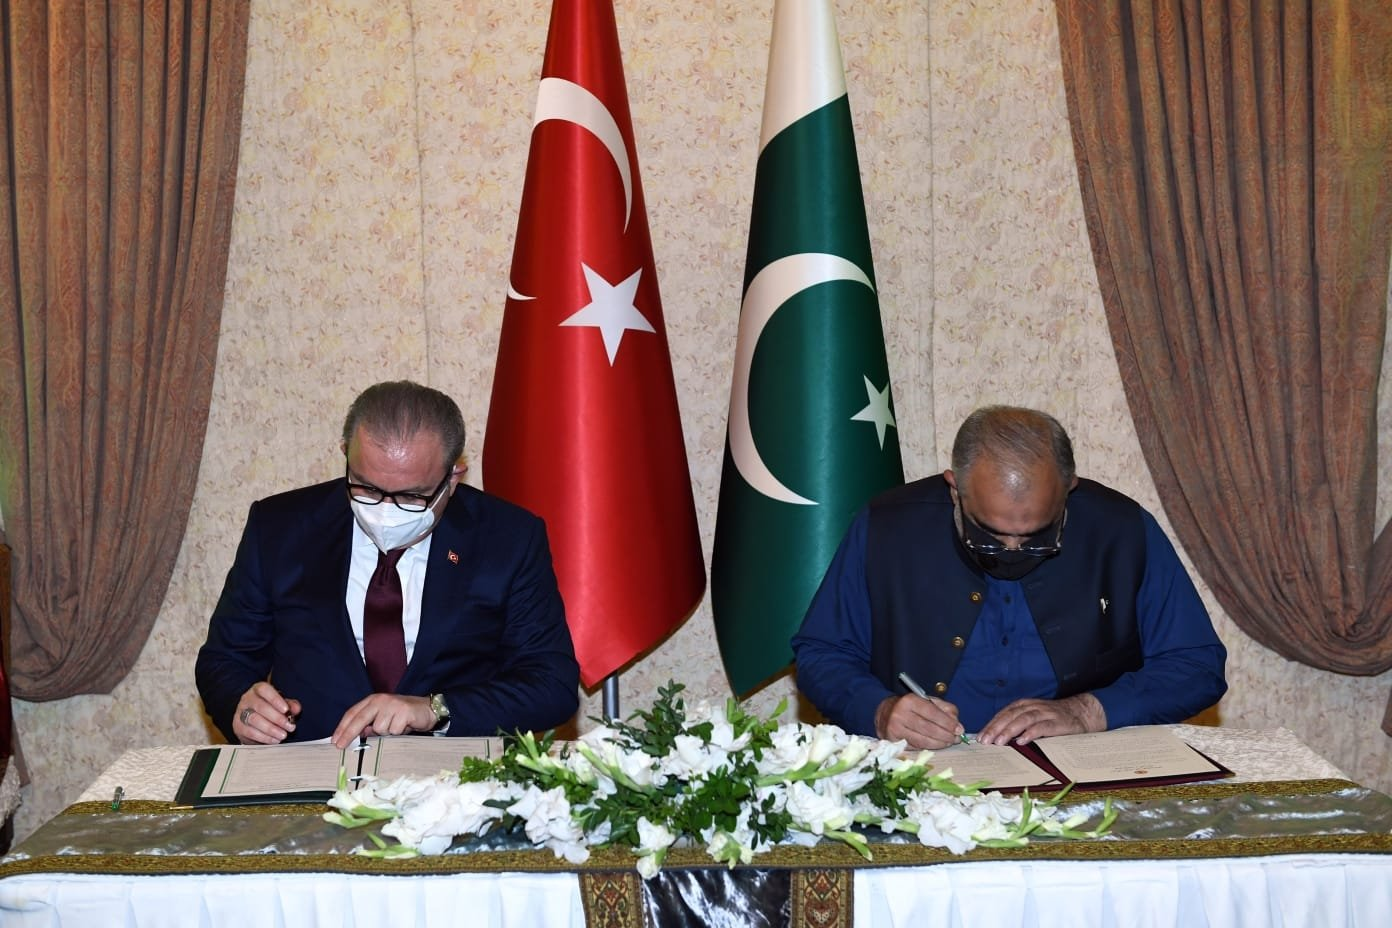 Turkey's Parliamentary Speaker Mustafa Şentop (L) and Asad Qaiser, speaker of Pakistan's National Assembly, sign a deal in Islamabad, Pakistan, June 1, 2021. (AA Photo)